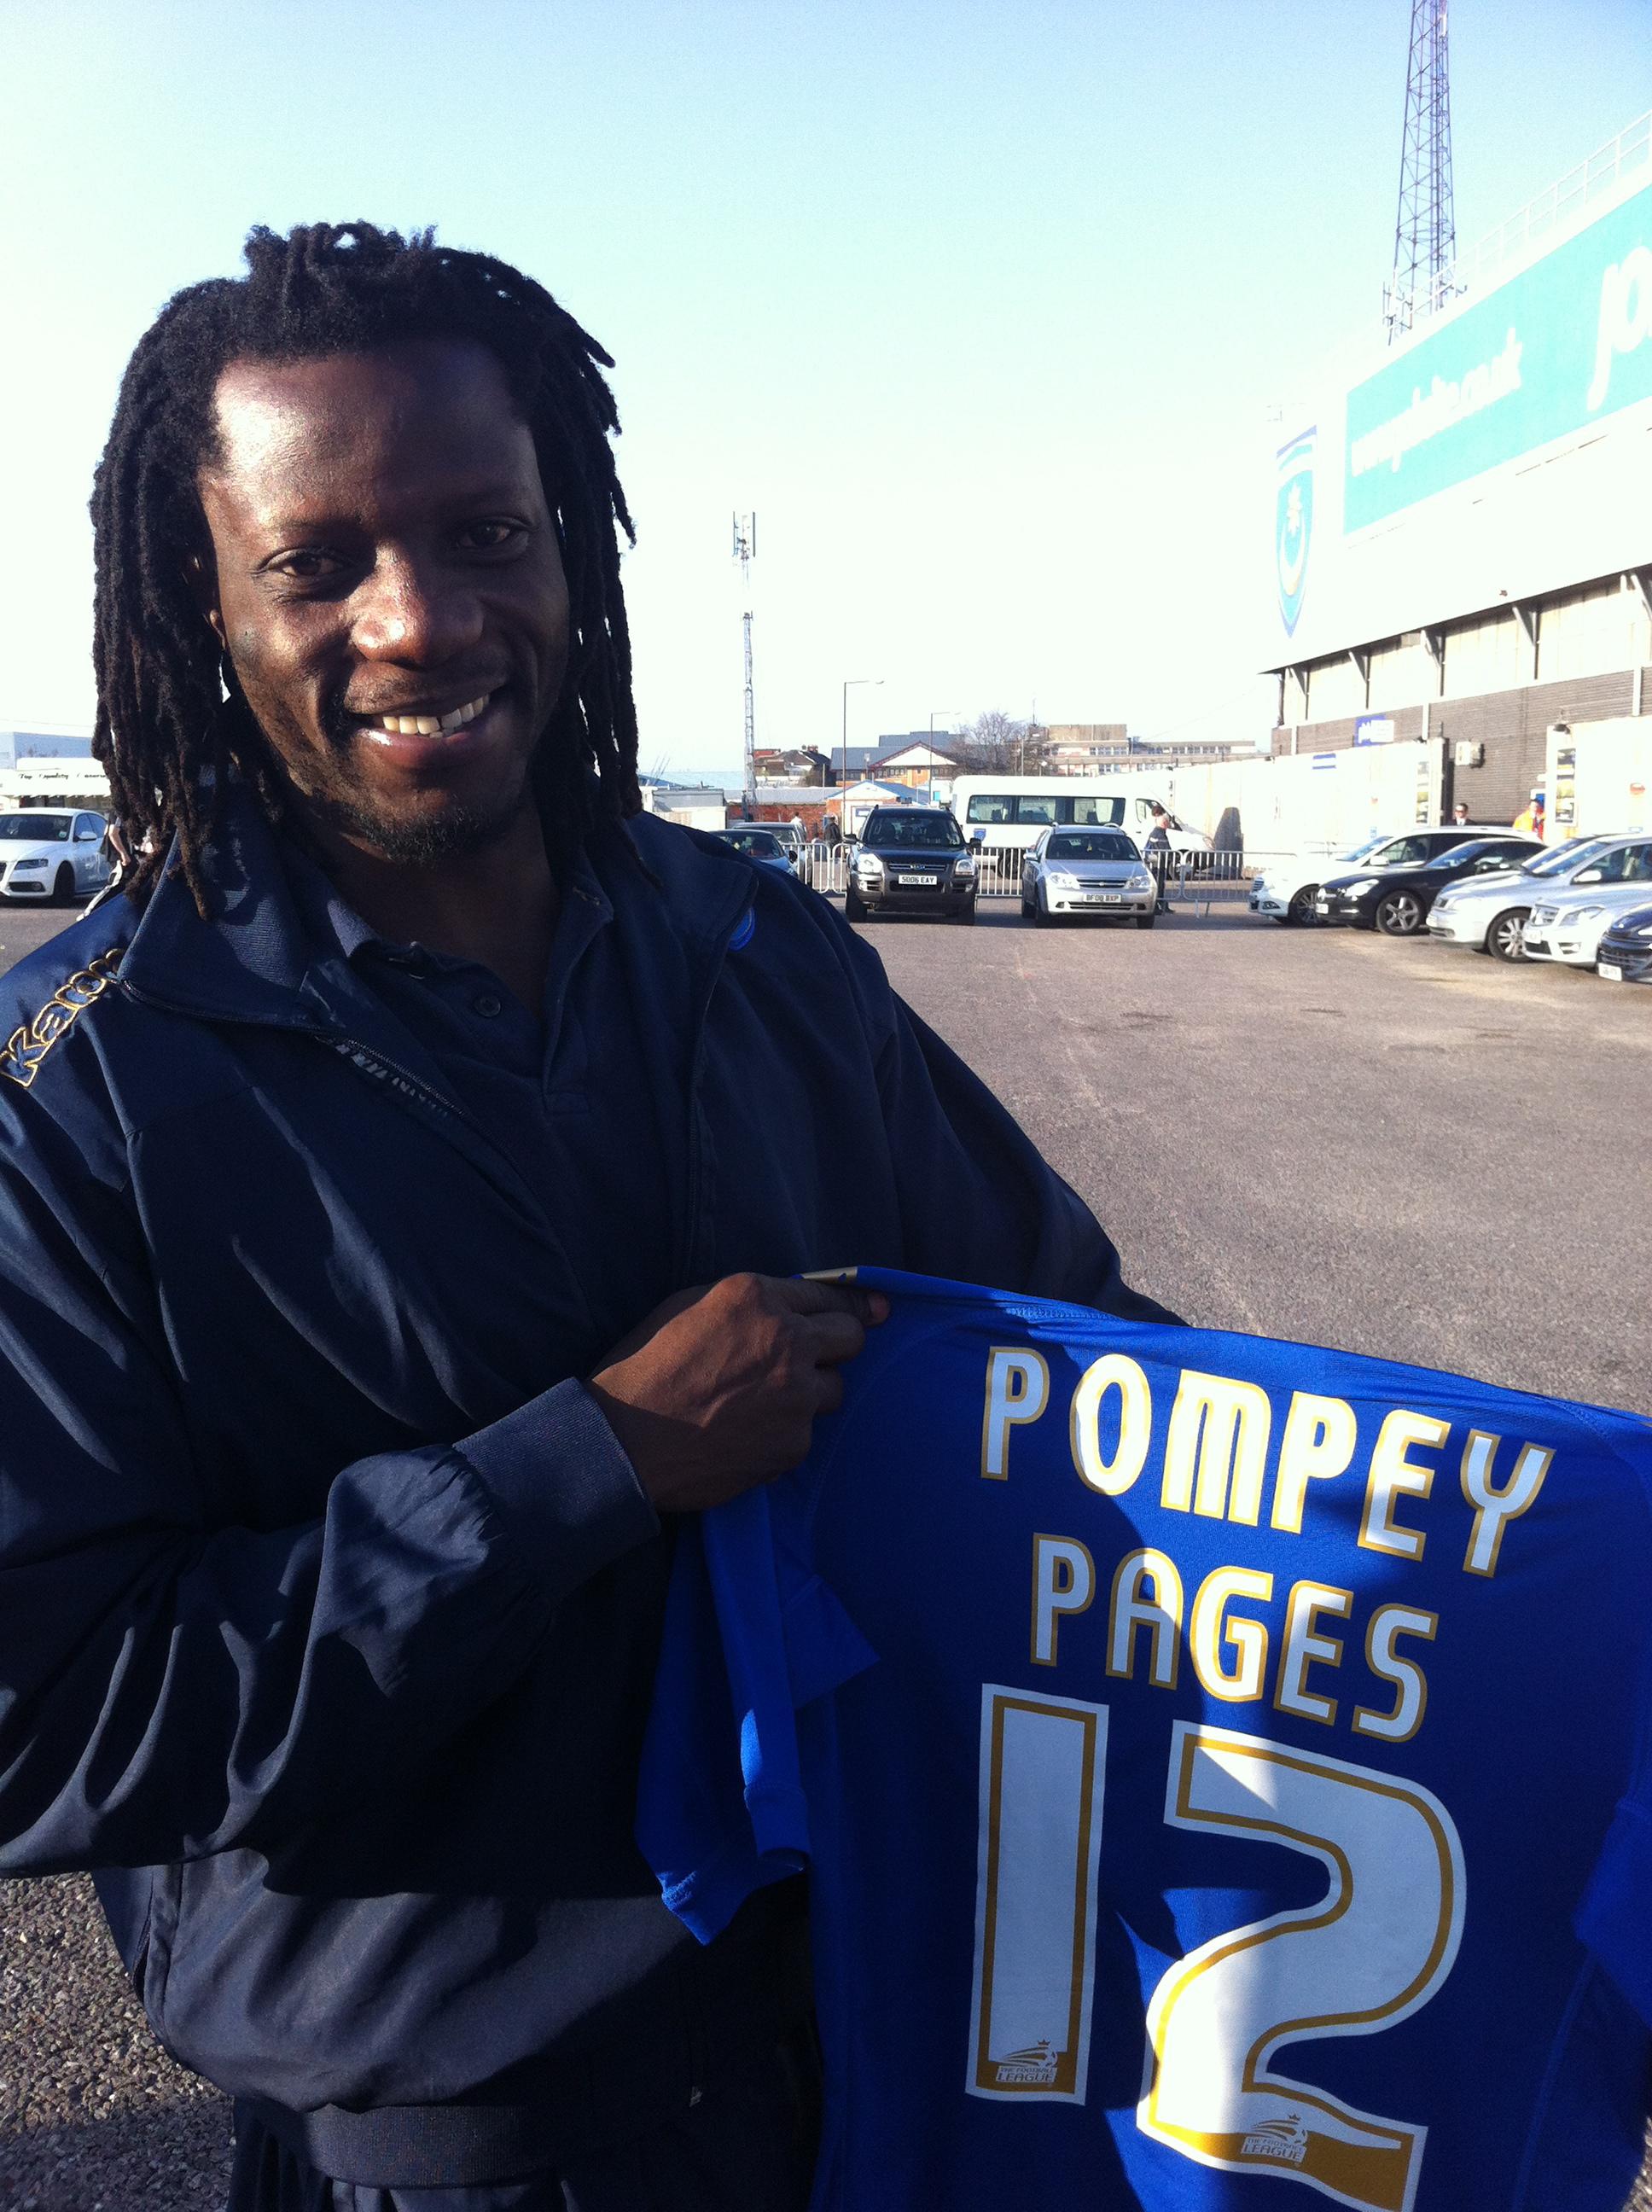 http://pompeypages.files.wordpress.com/2012/03/img_1723.jpg